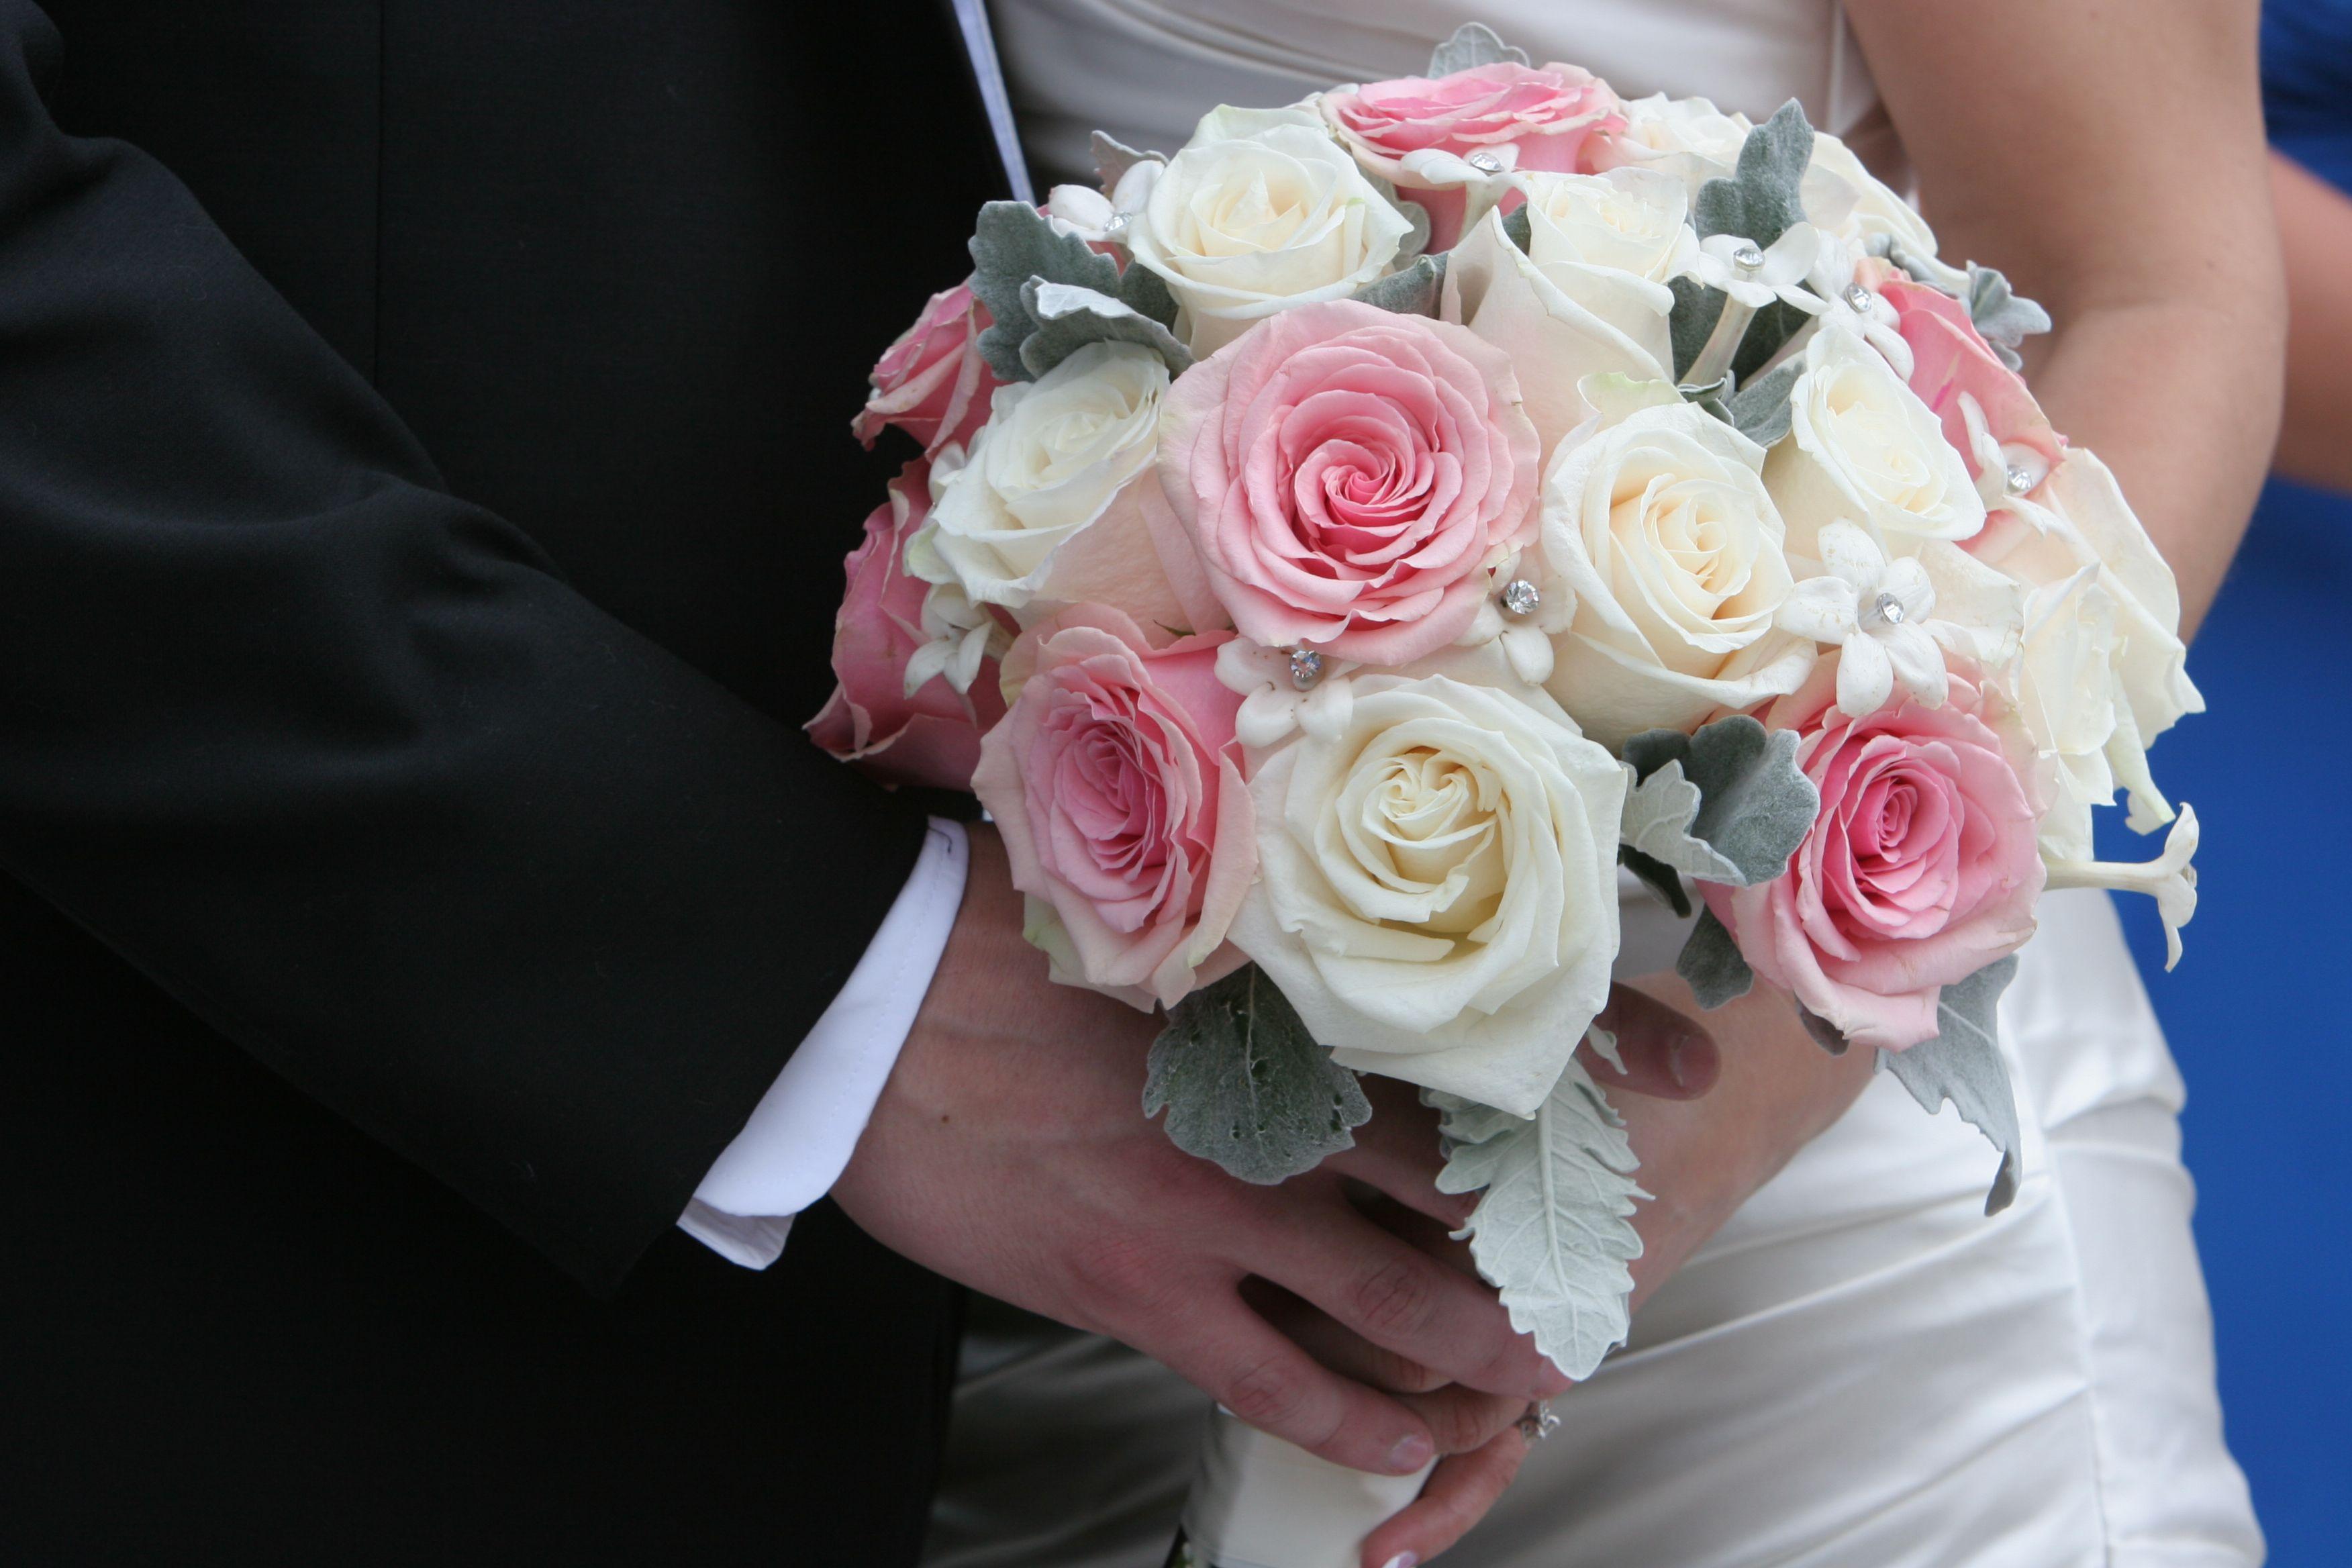 Unusual beautiful beginnings flowers photos wedding and flowers pin by beautiful beginnings flowers on jenna and lawrences wedding izmirmasajfo